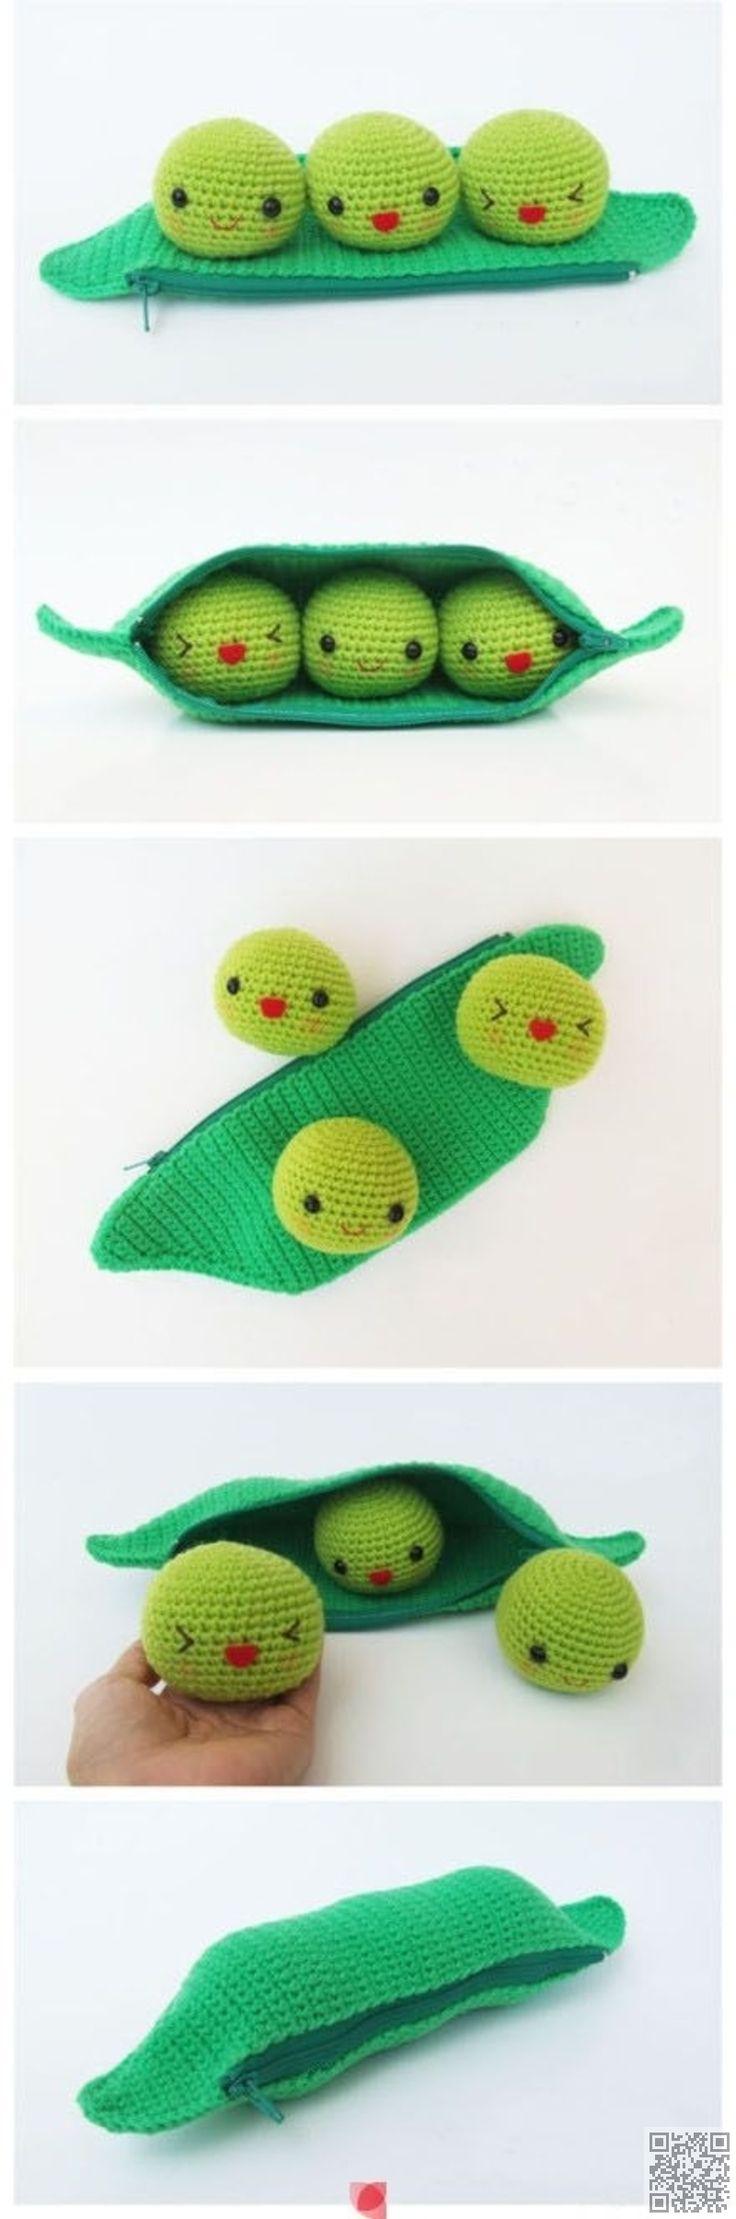 best jusu doinu DIYs images on Pinterest Crochet patterns